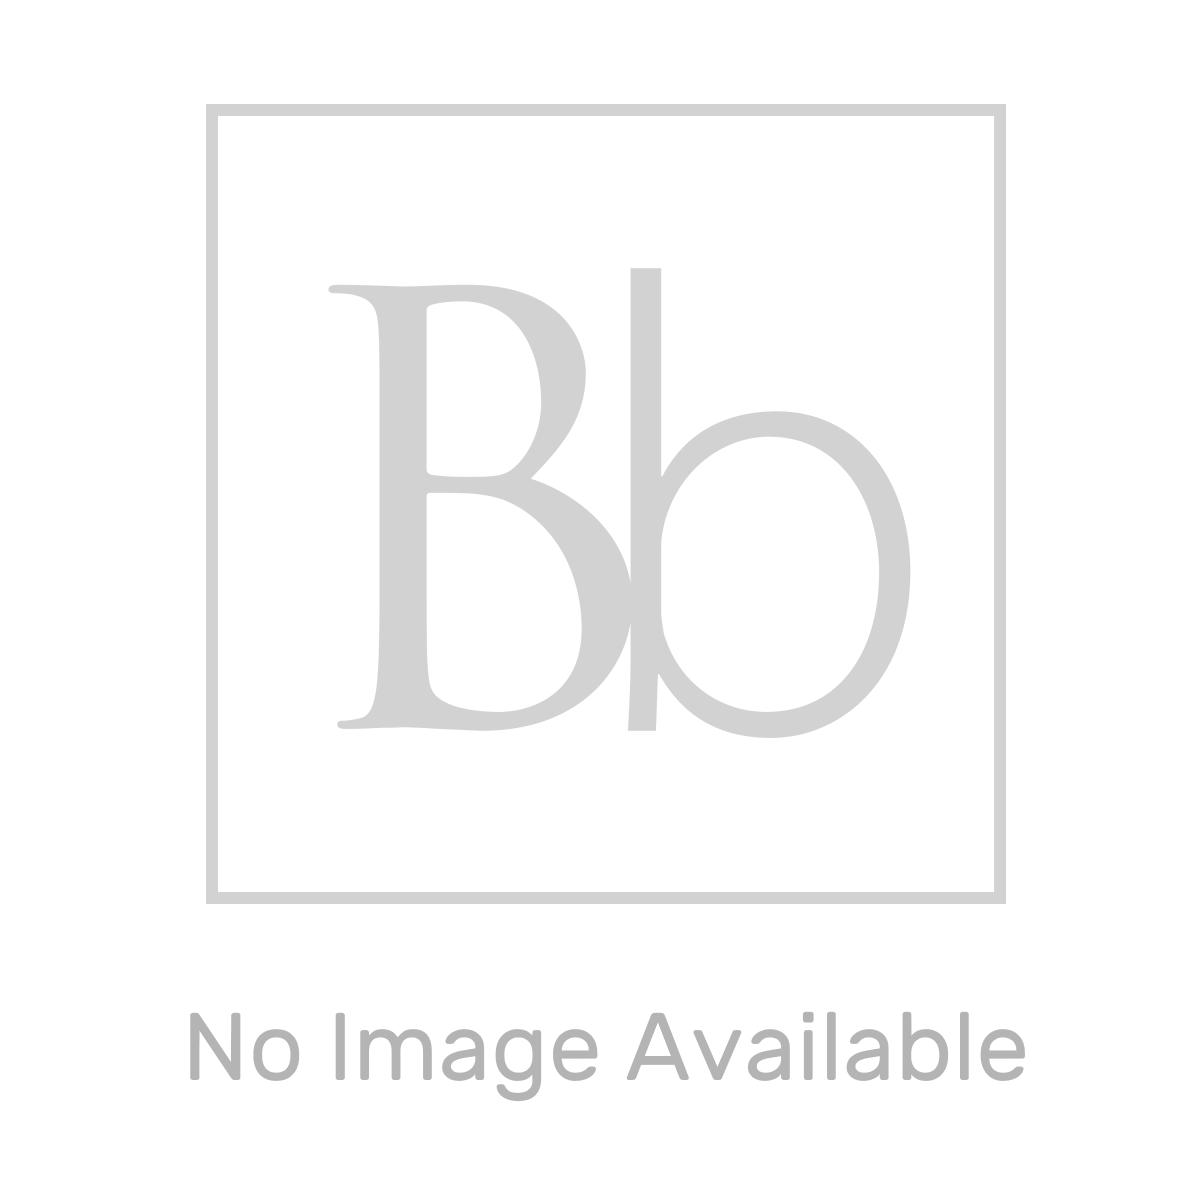 Frontline Ferrara Thermostatic Shower Column with Chrome Fixed Head